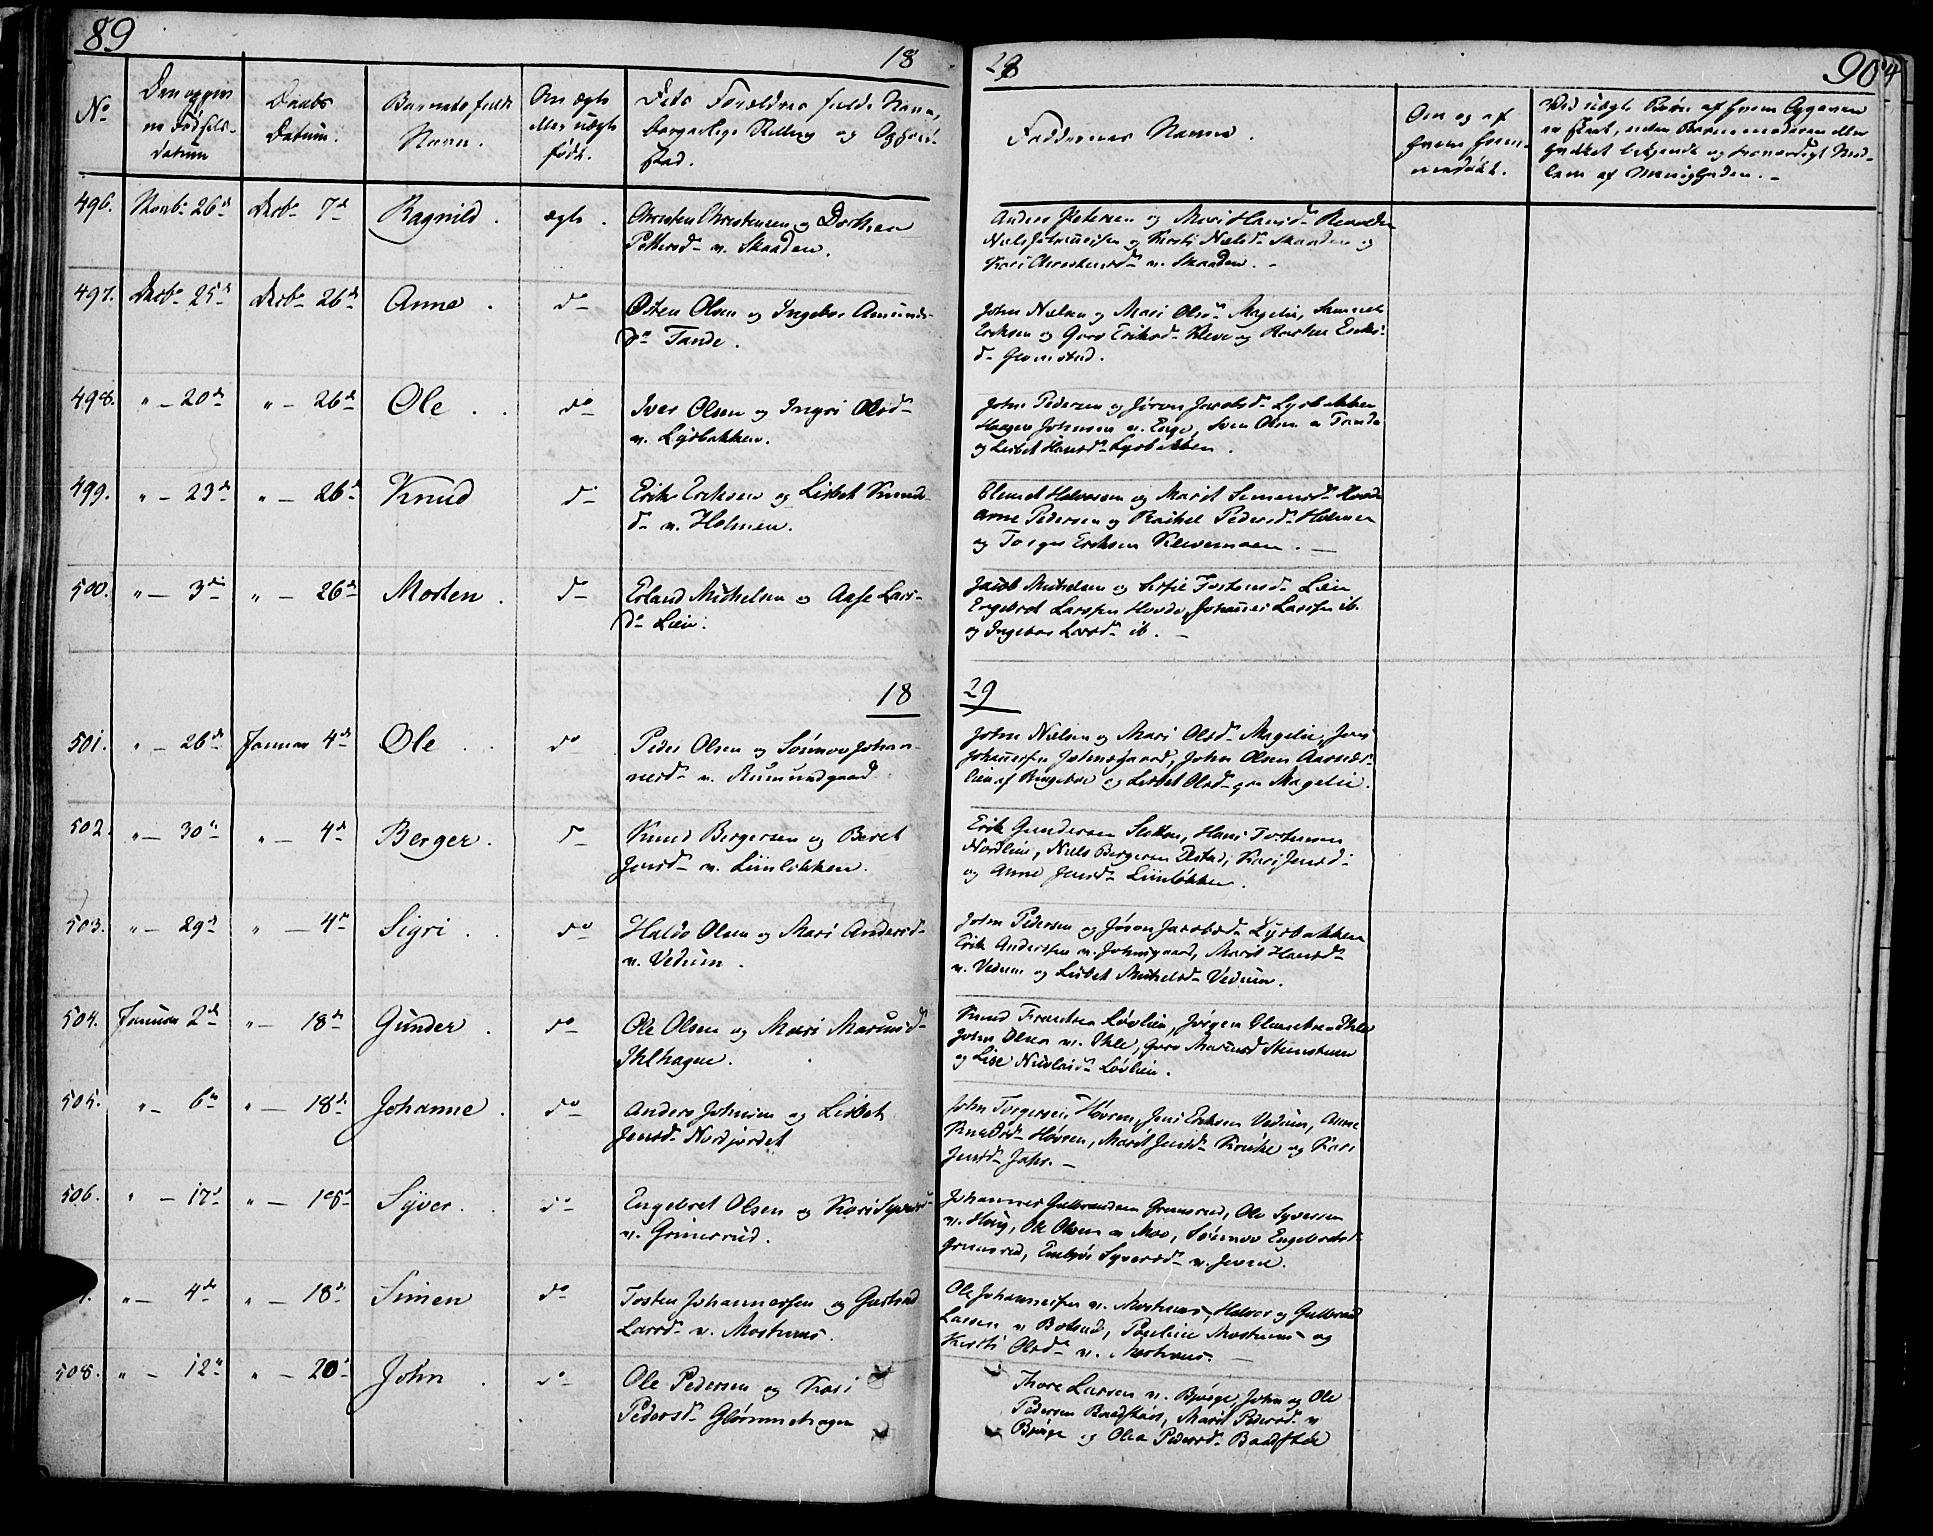 SAH, Øyer prestekontor, Ministerialbok nr. 4, 1824-1841, s. 89-90